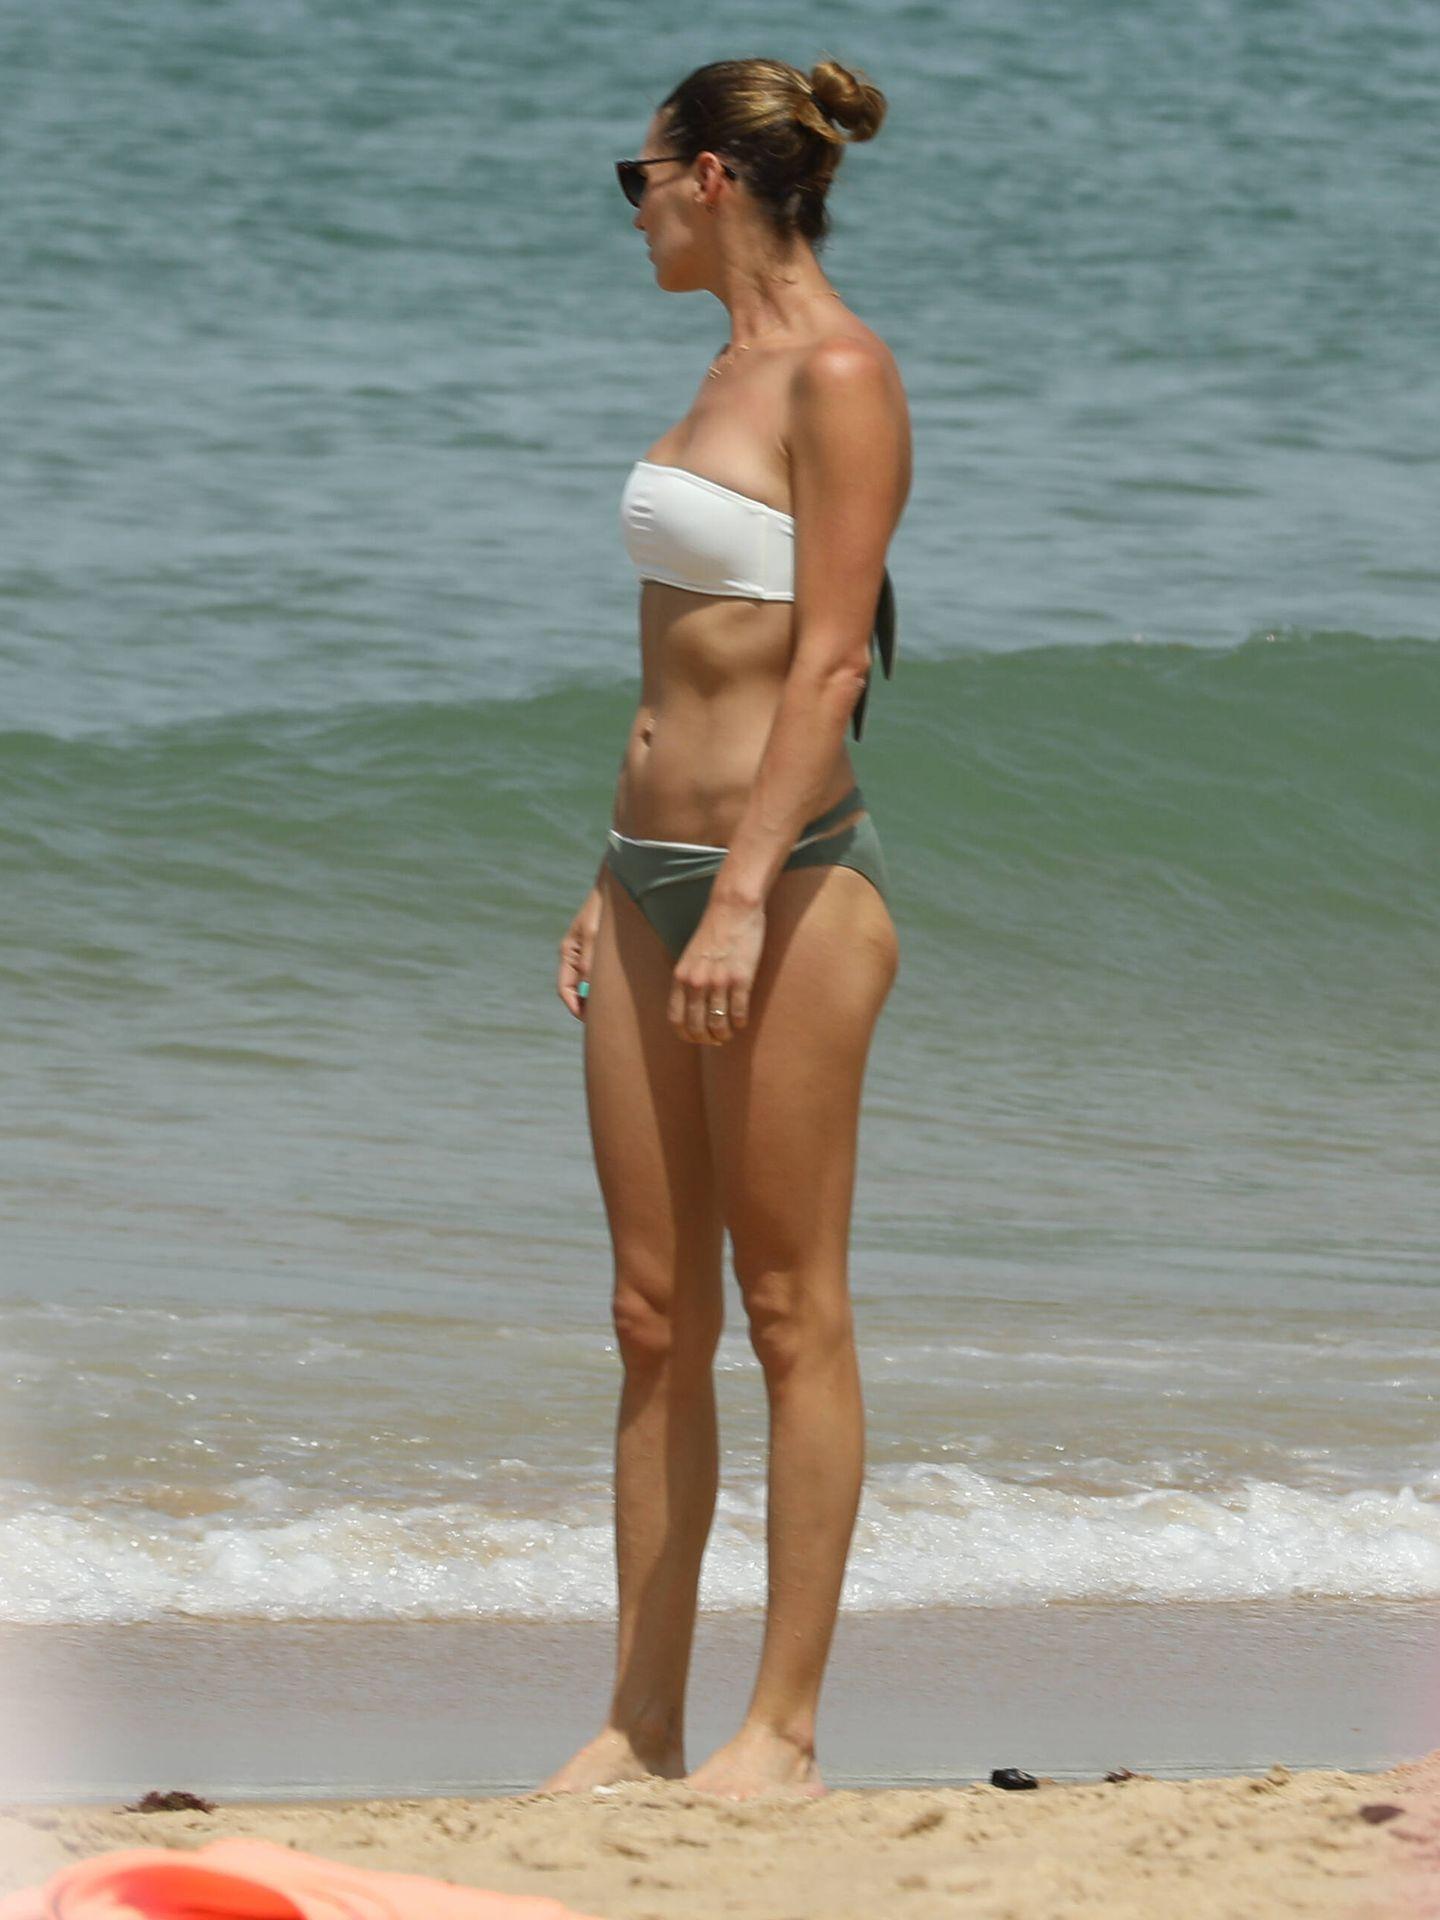 Eugenia, en la playa del buzo. (Clipper)